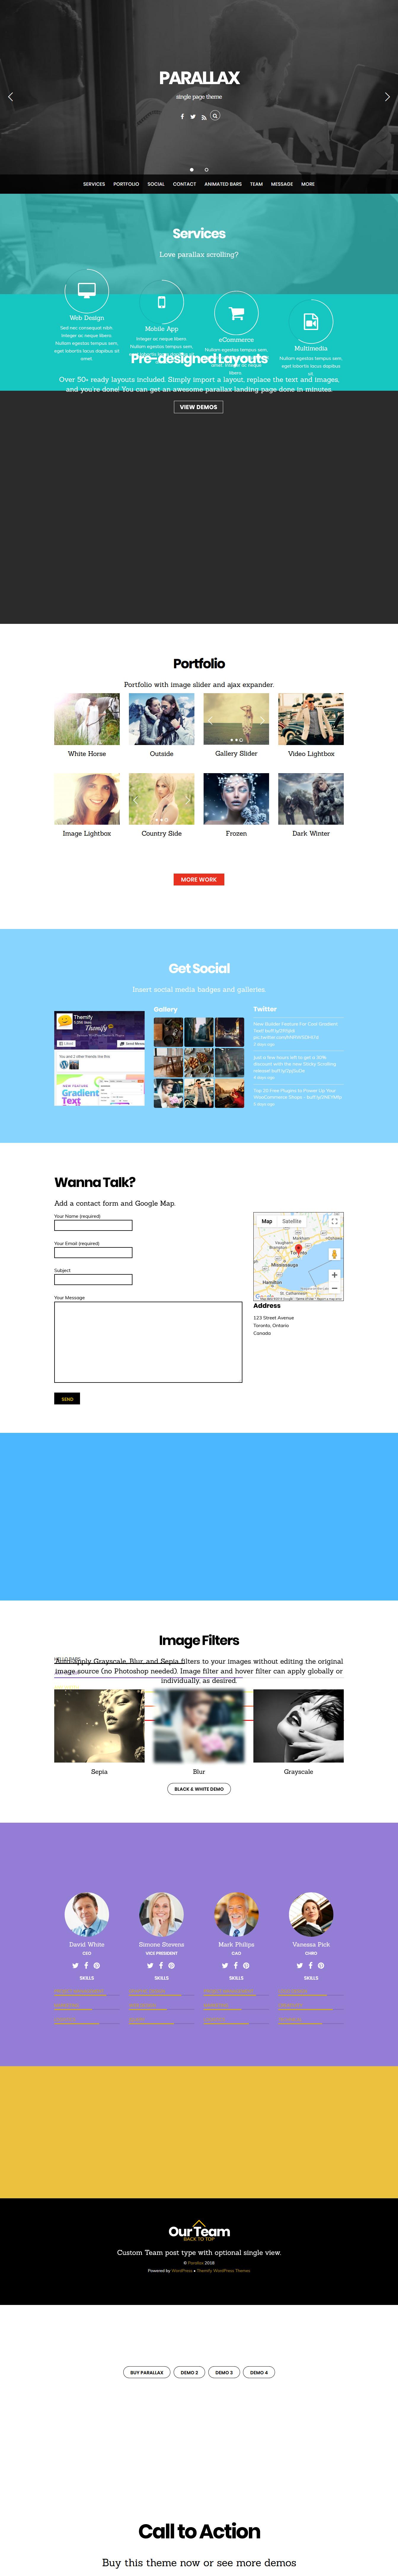 Parallax - Best Premium Parallax WordPress Theme